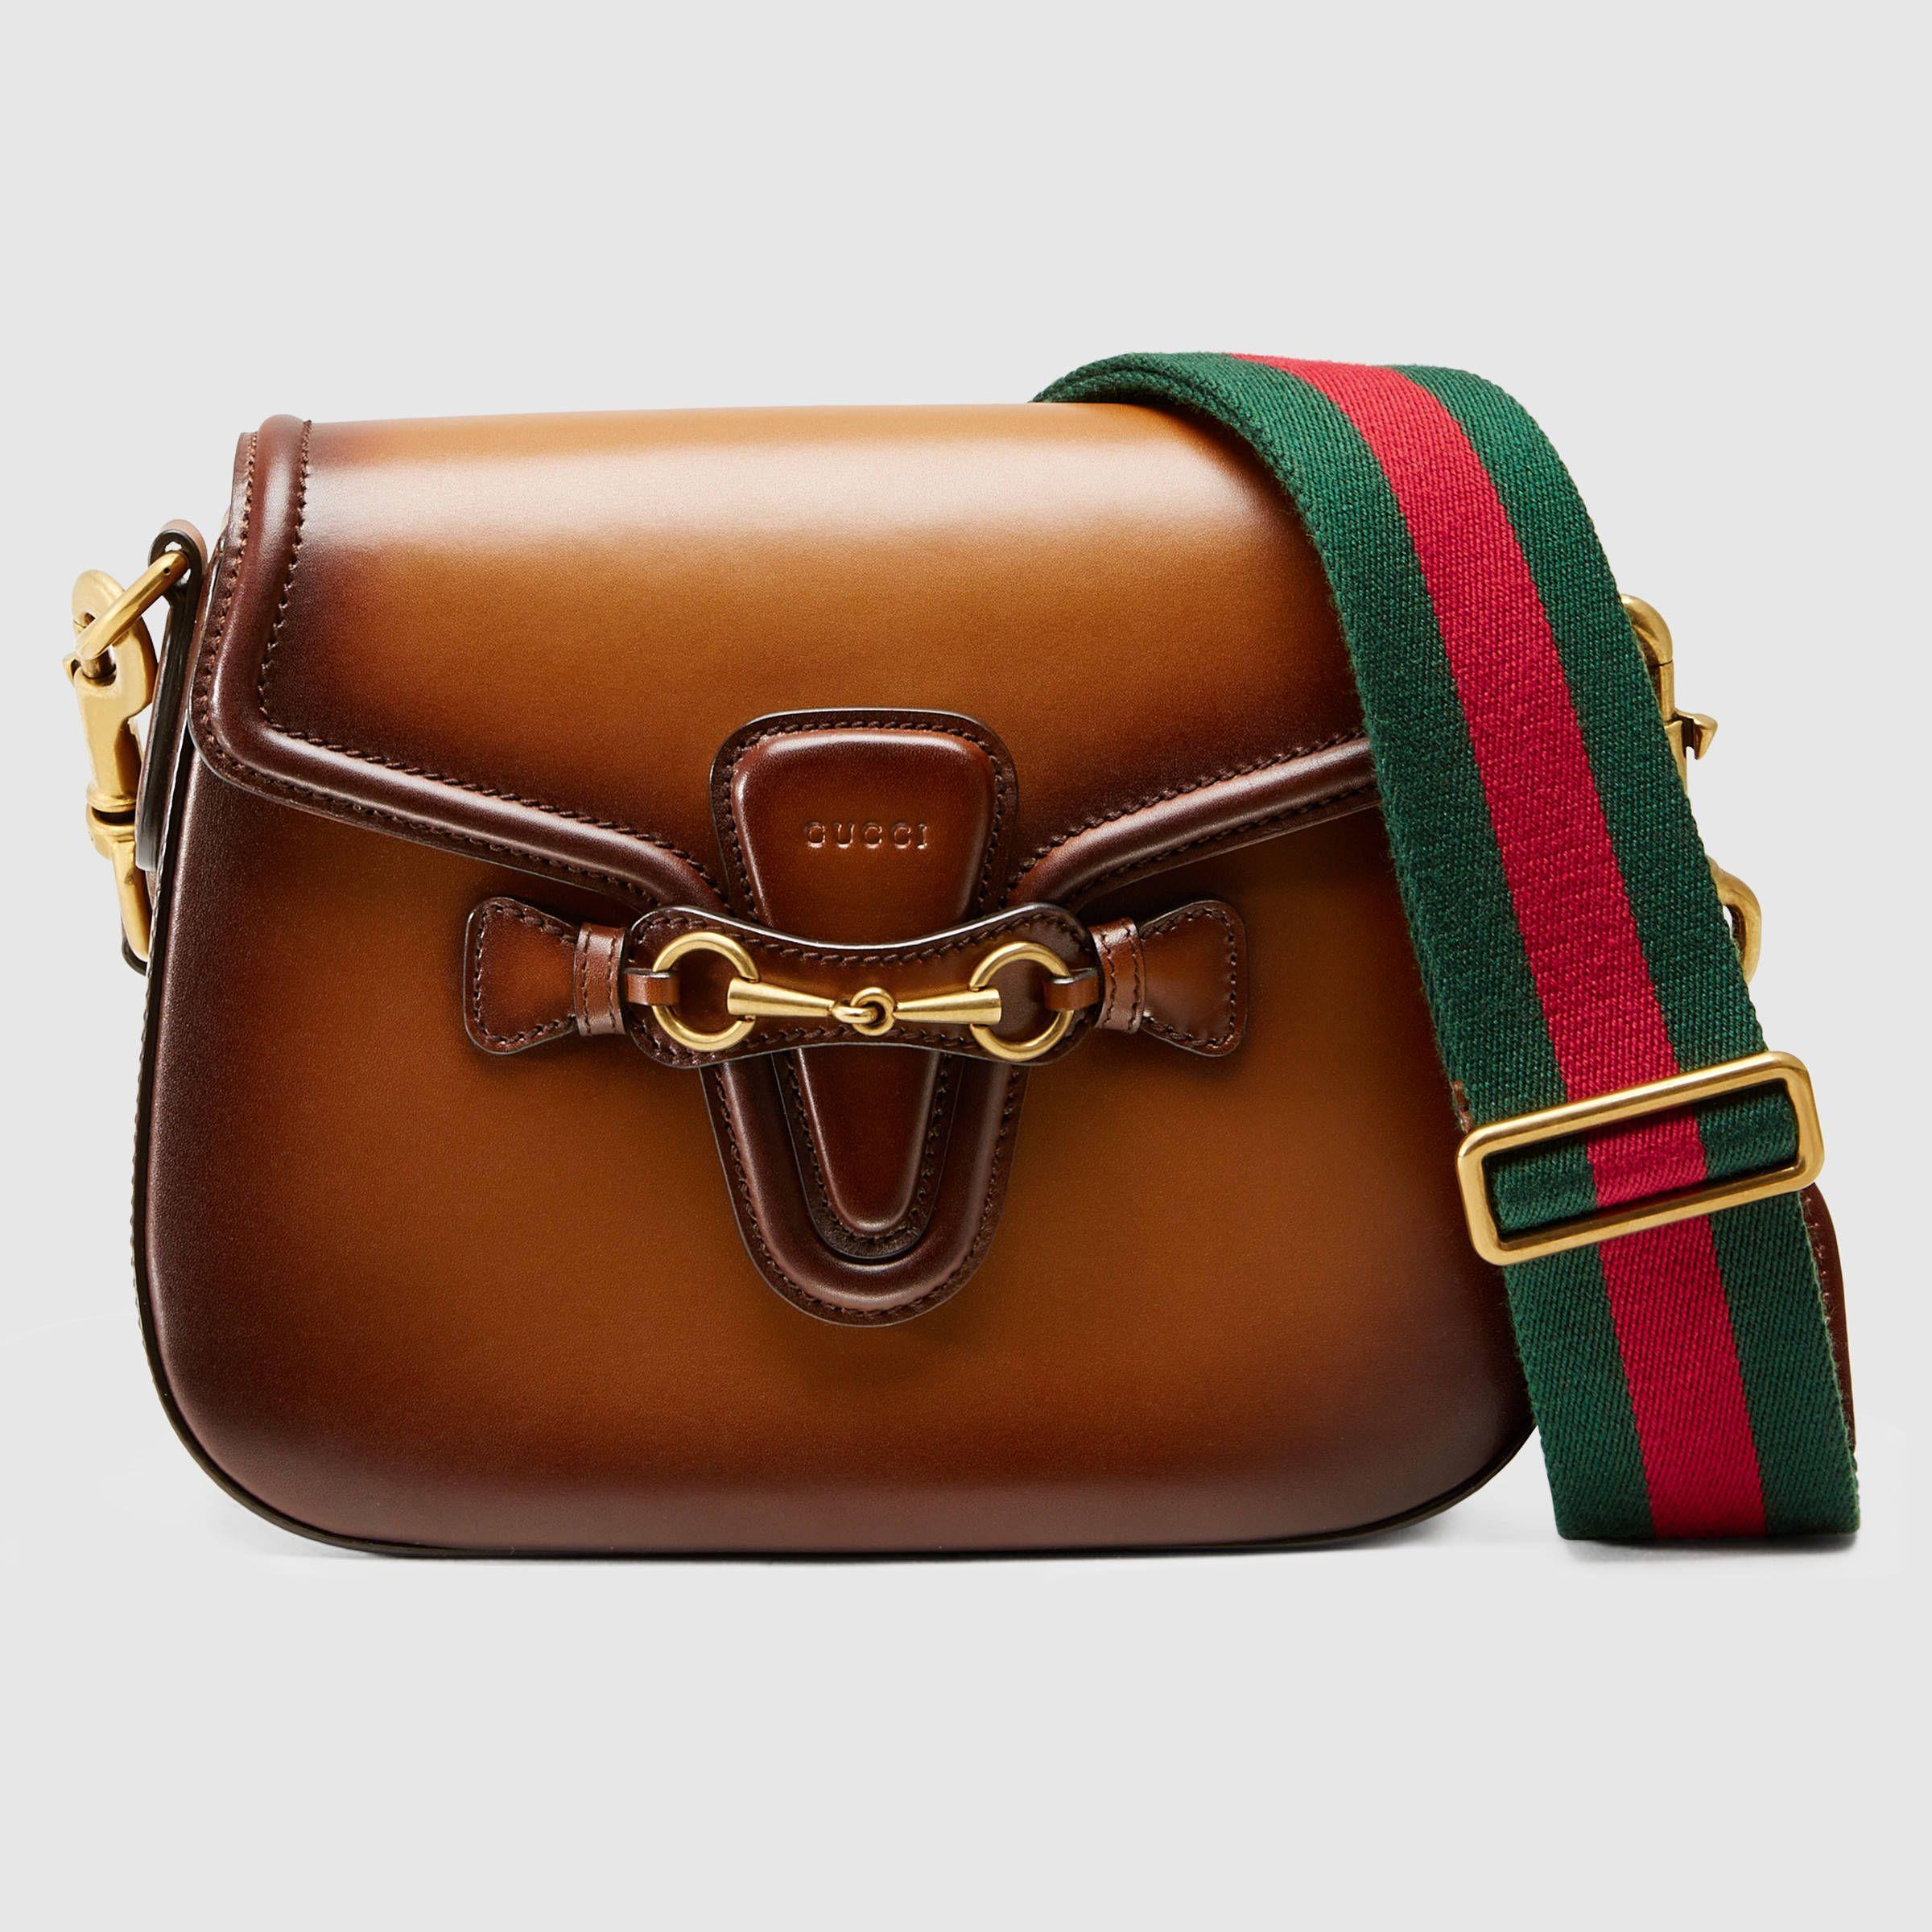 Gucci Women - Lady Web leather shoulder bag - 380573B012A2574 ... 986681748